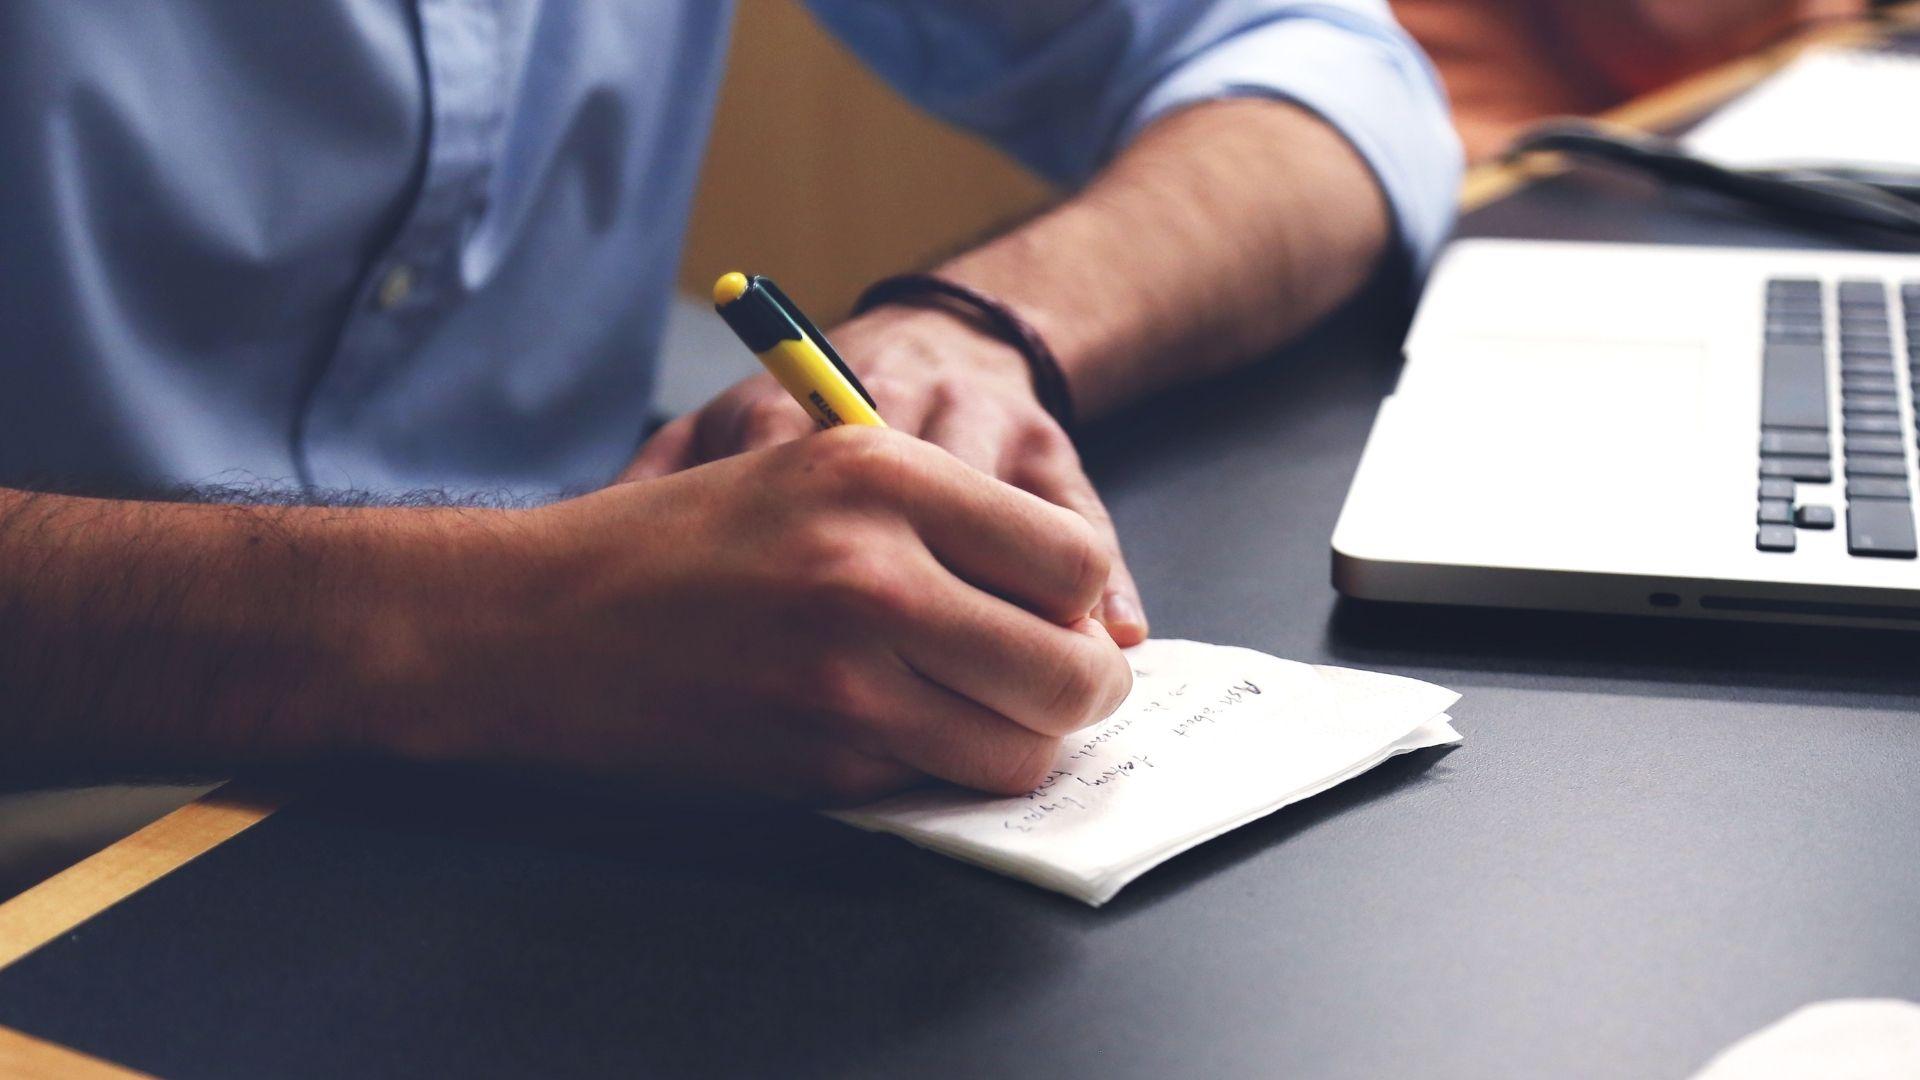 Cinco cursos gratuitos sobre empreendedorismo